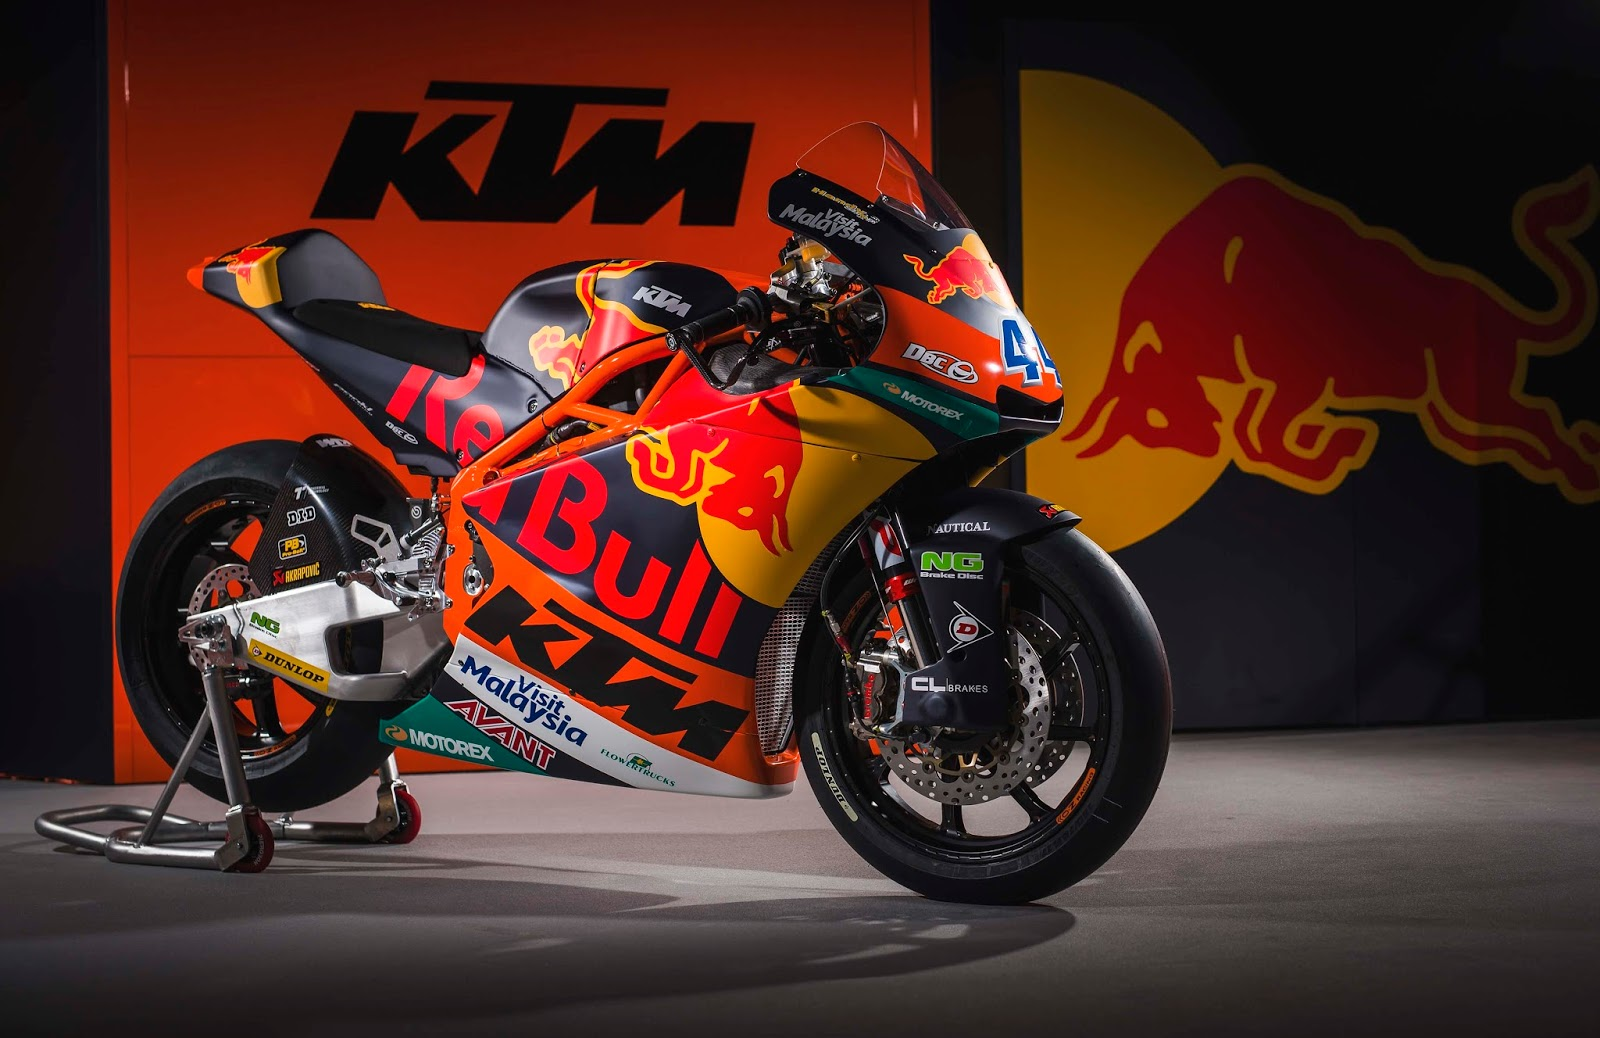 Racing Caf 232 Ktm Moto2 Red Bull Ktm Team 2017